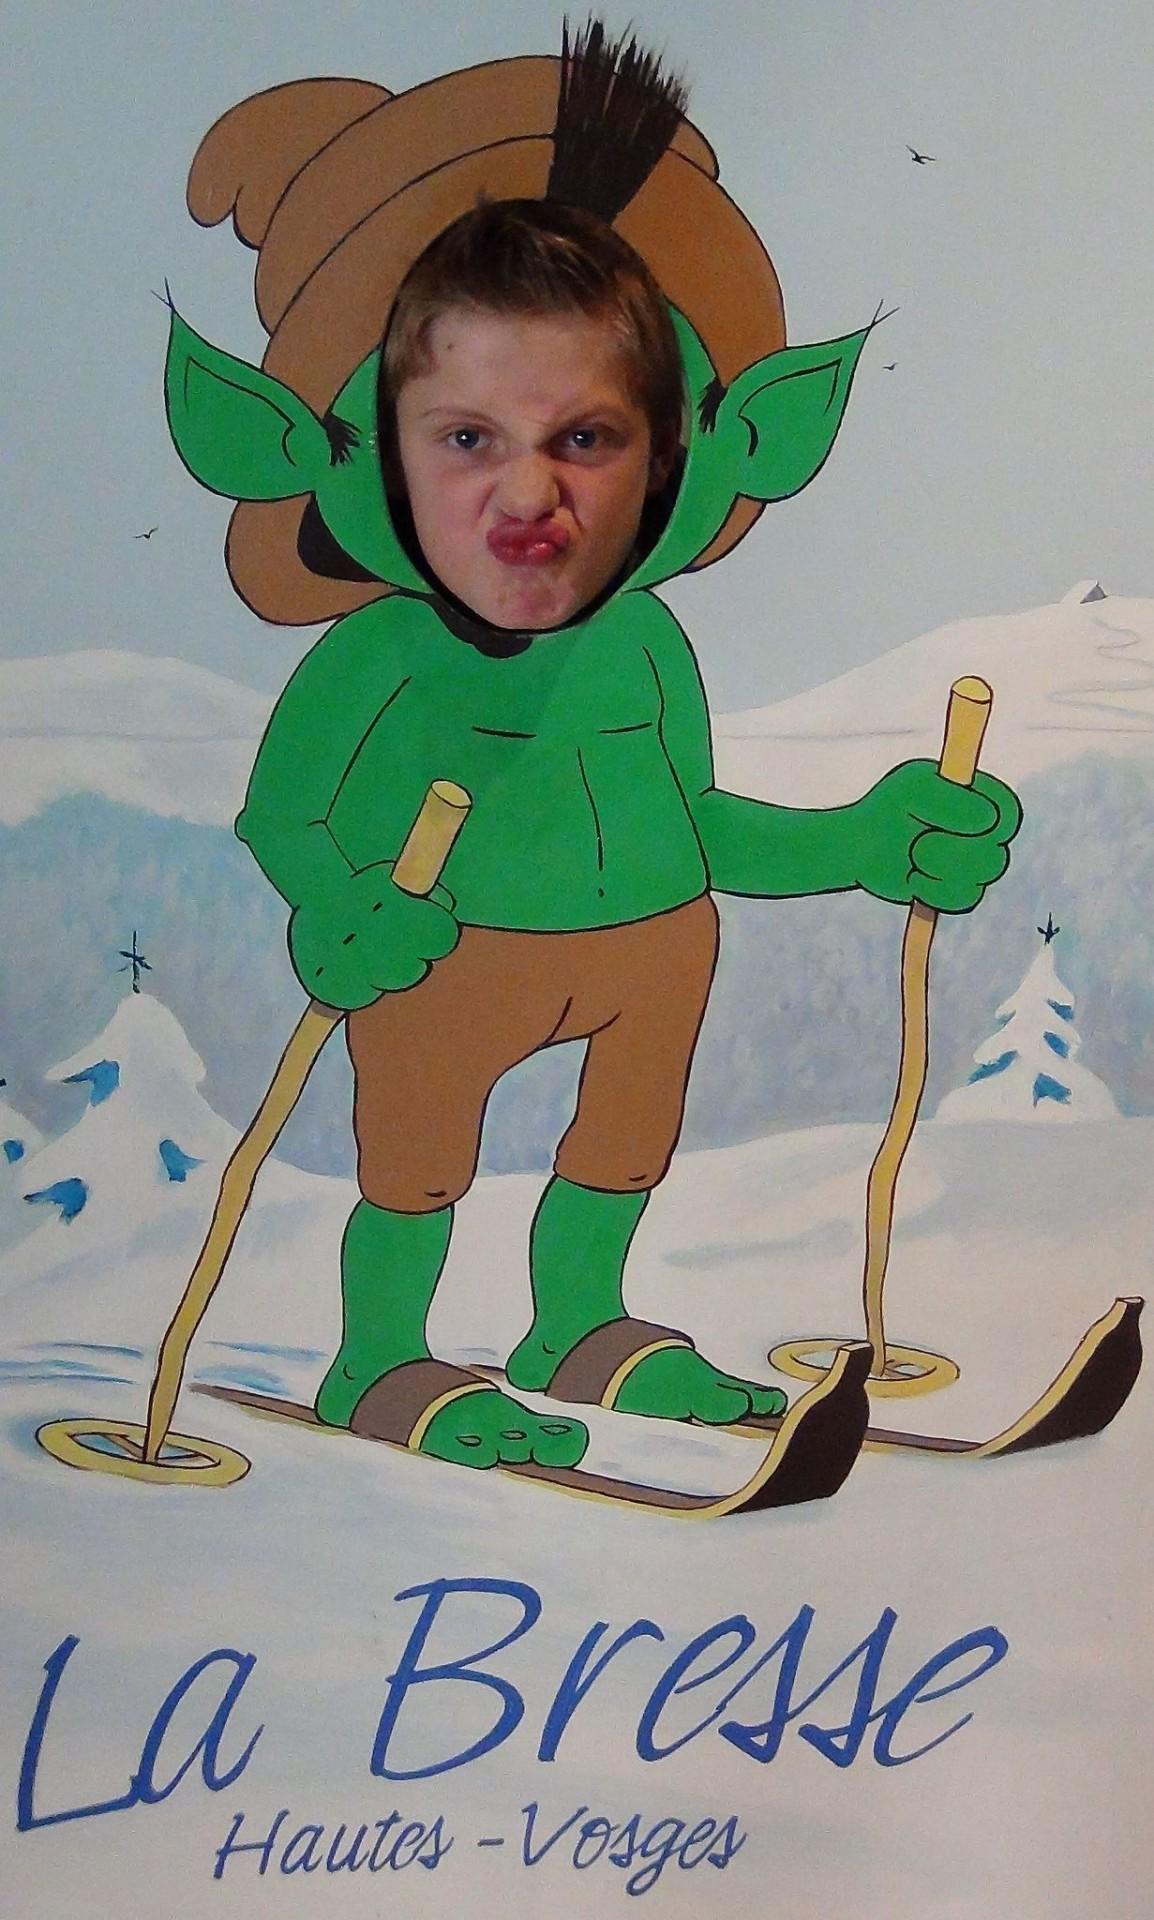 Galerie photo Anice le Sotré au ski